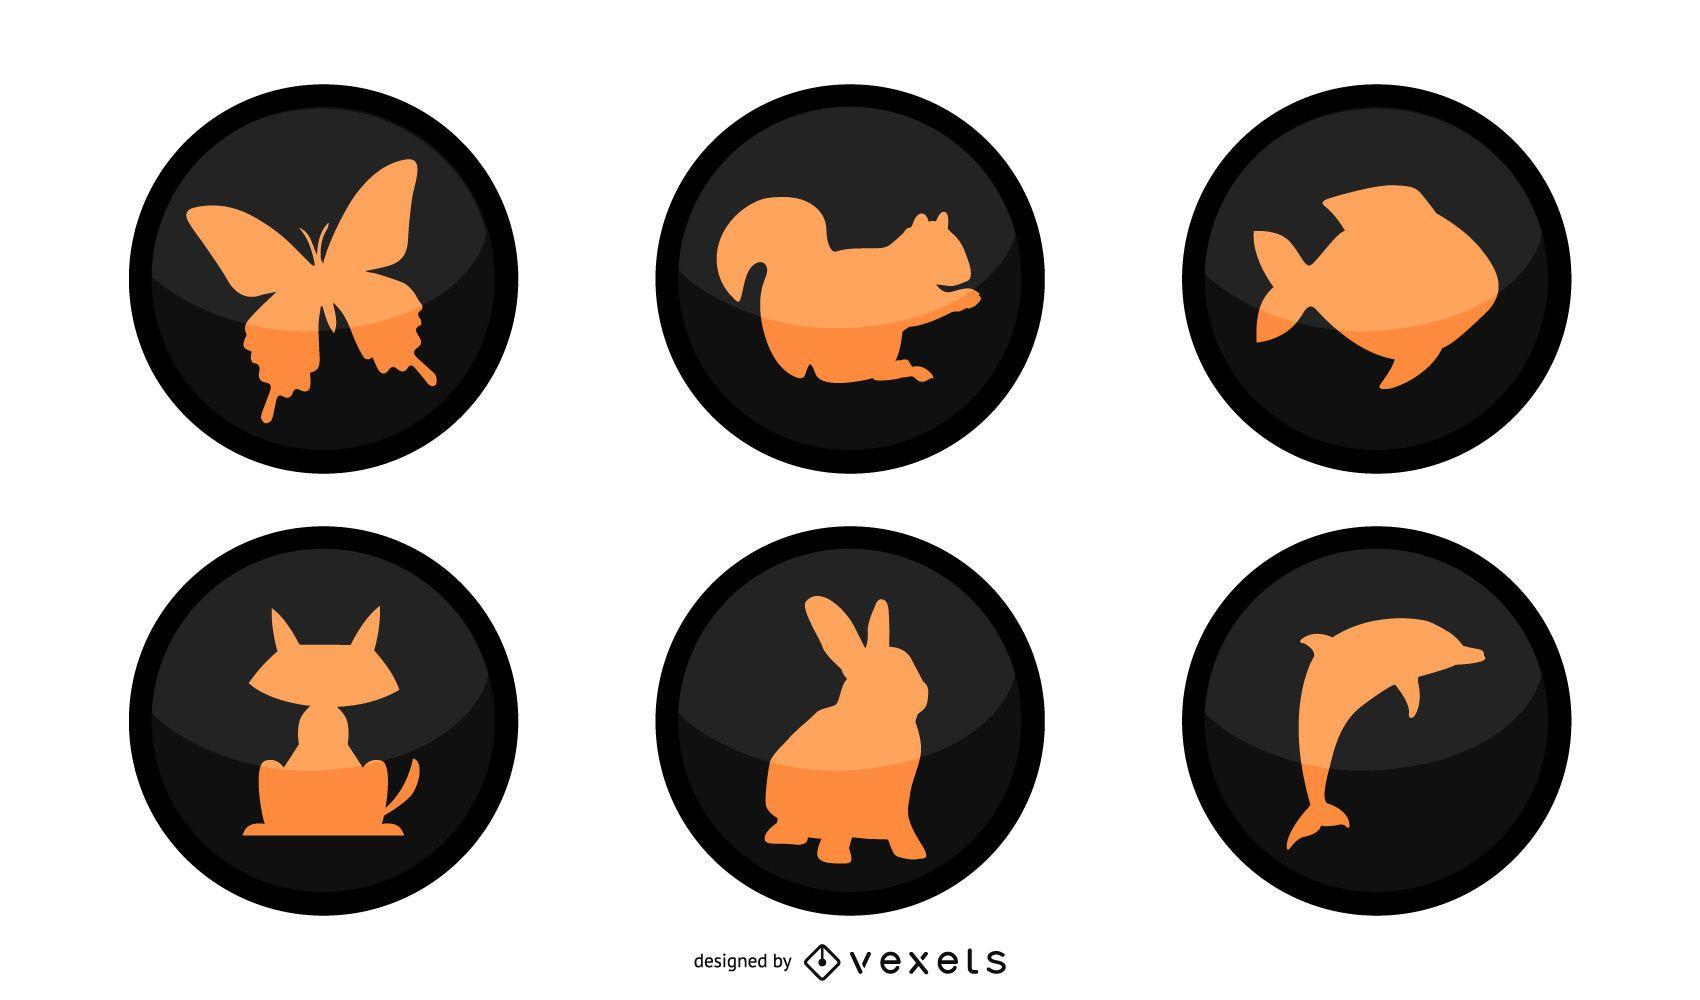 Silhouette Animals Black Circular Buttons